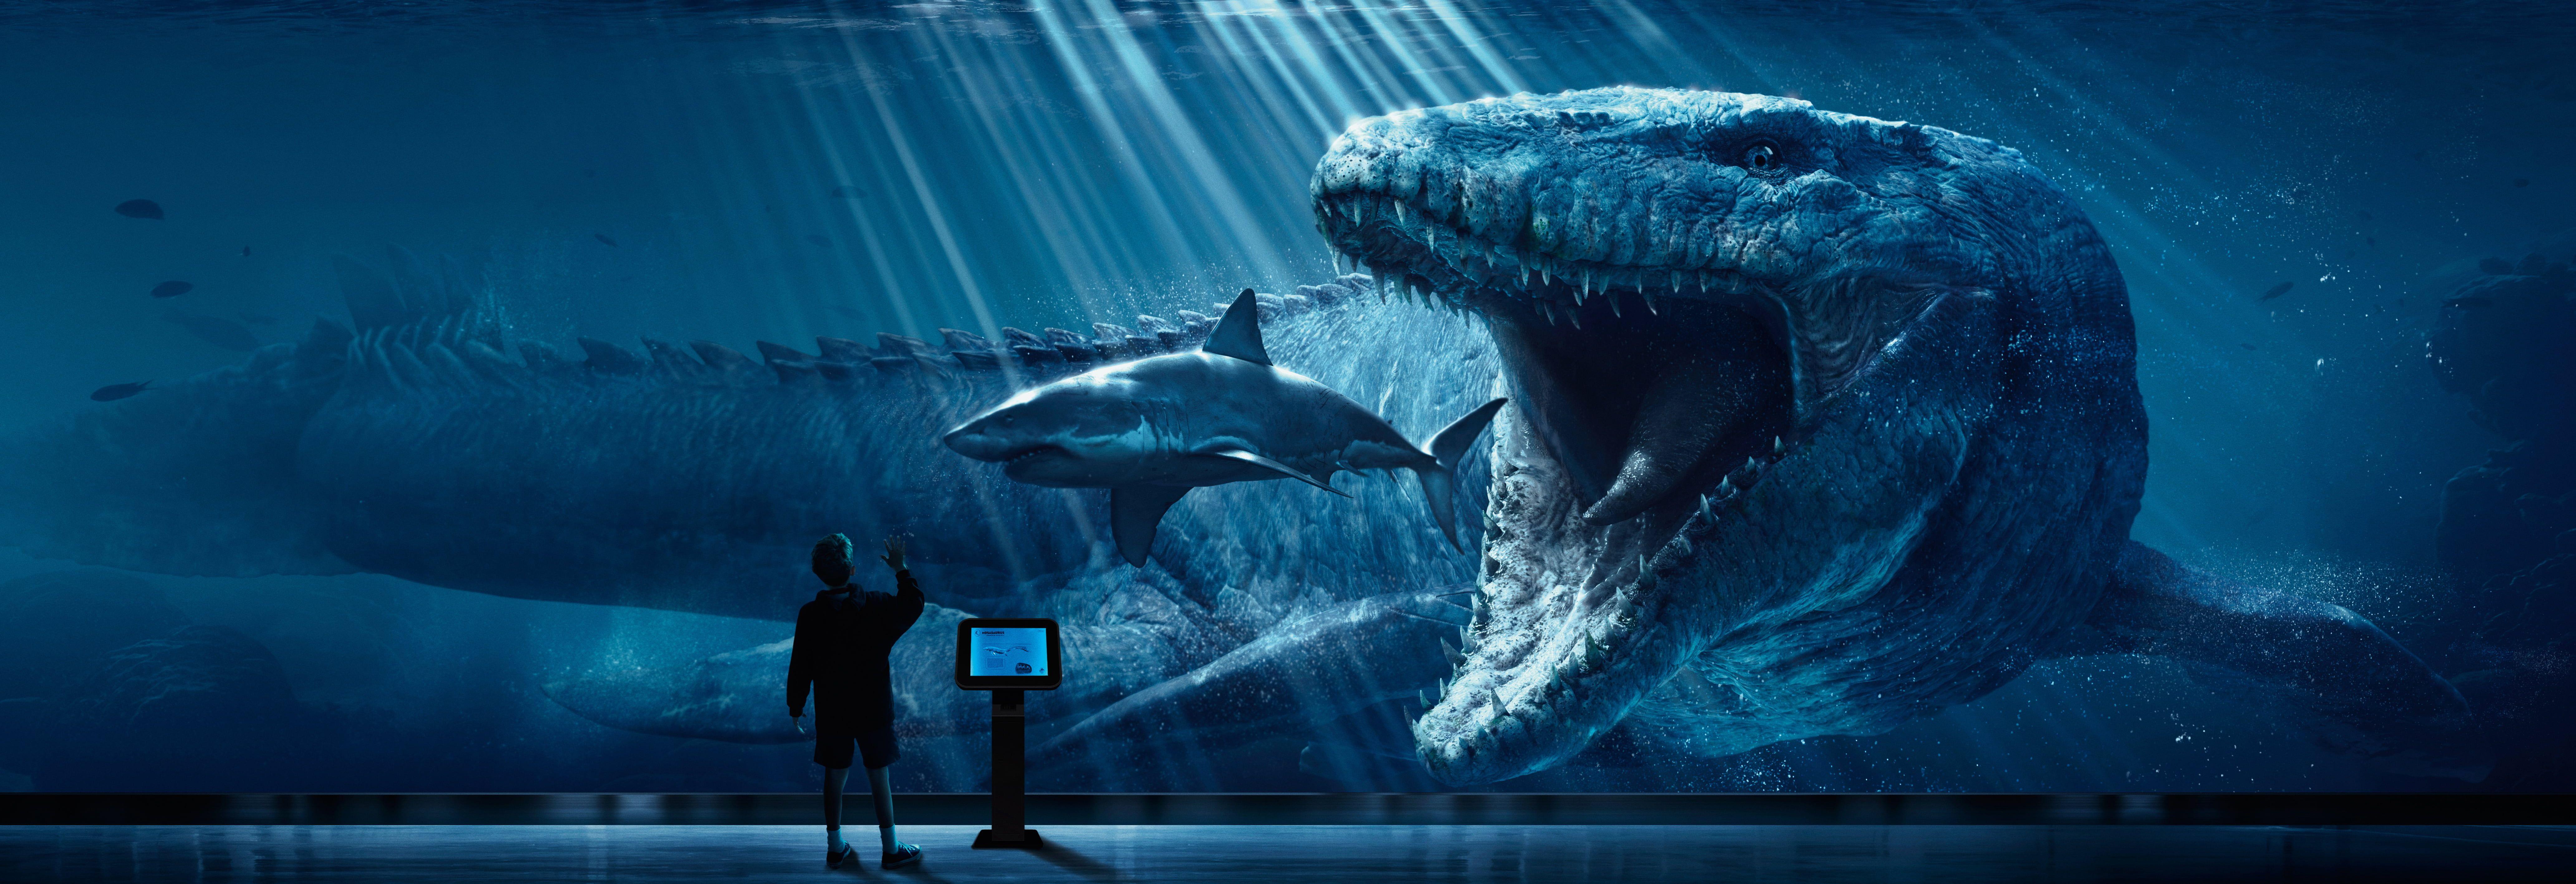 Megalodon Wallpaper Digital Art Jurassic World Shark Dinosaurs Jurassic Park Prehistoric 8k Wallp Jurassic World Poster Jurassic World Jurassic World 2015